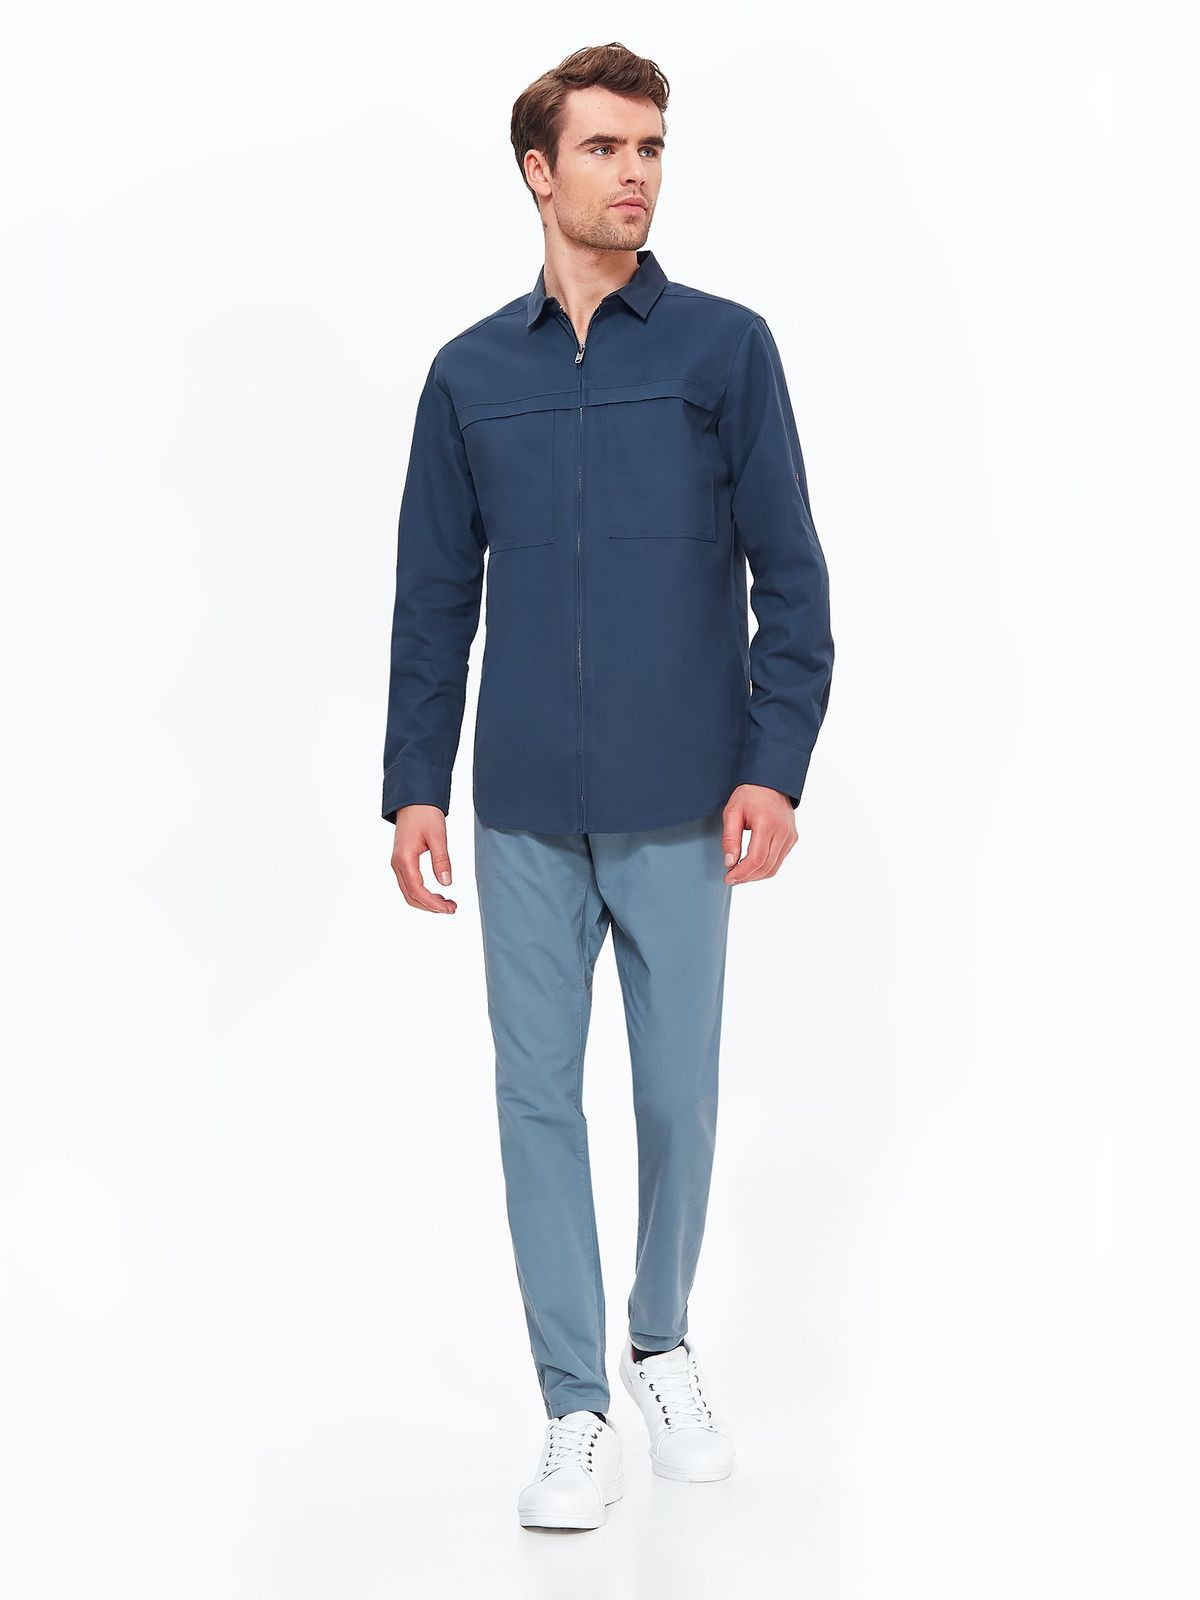 TOP SECRET TOP SECRET ζακετα στυλ πουκαμισο